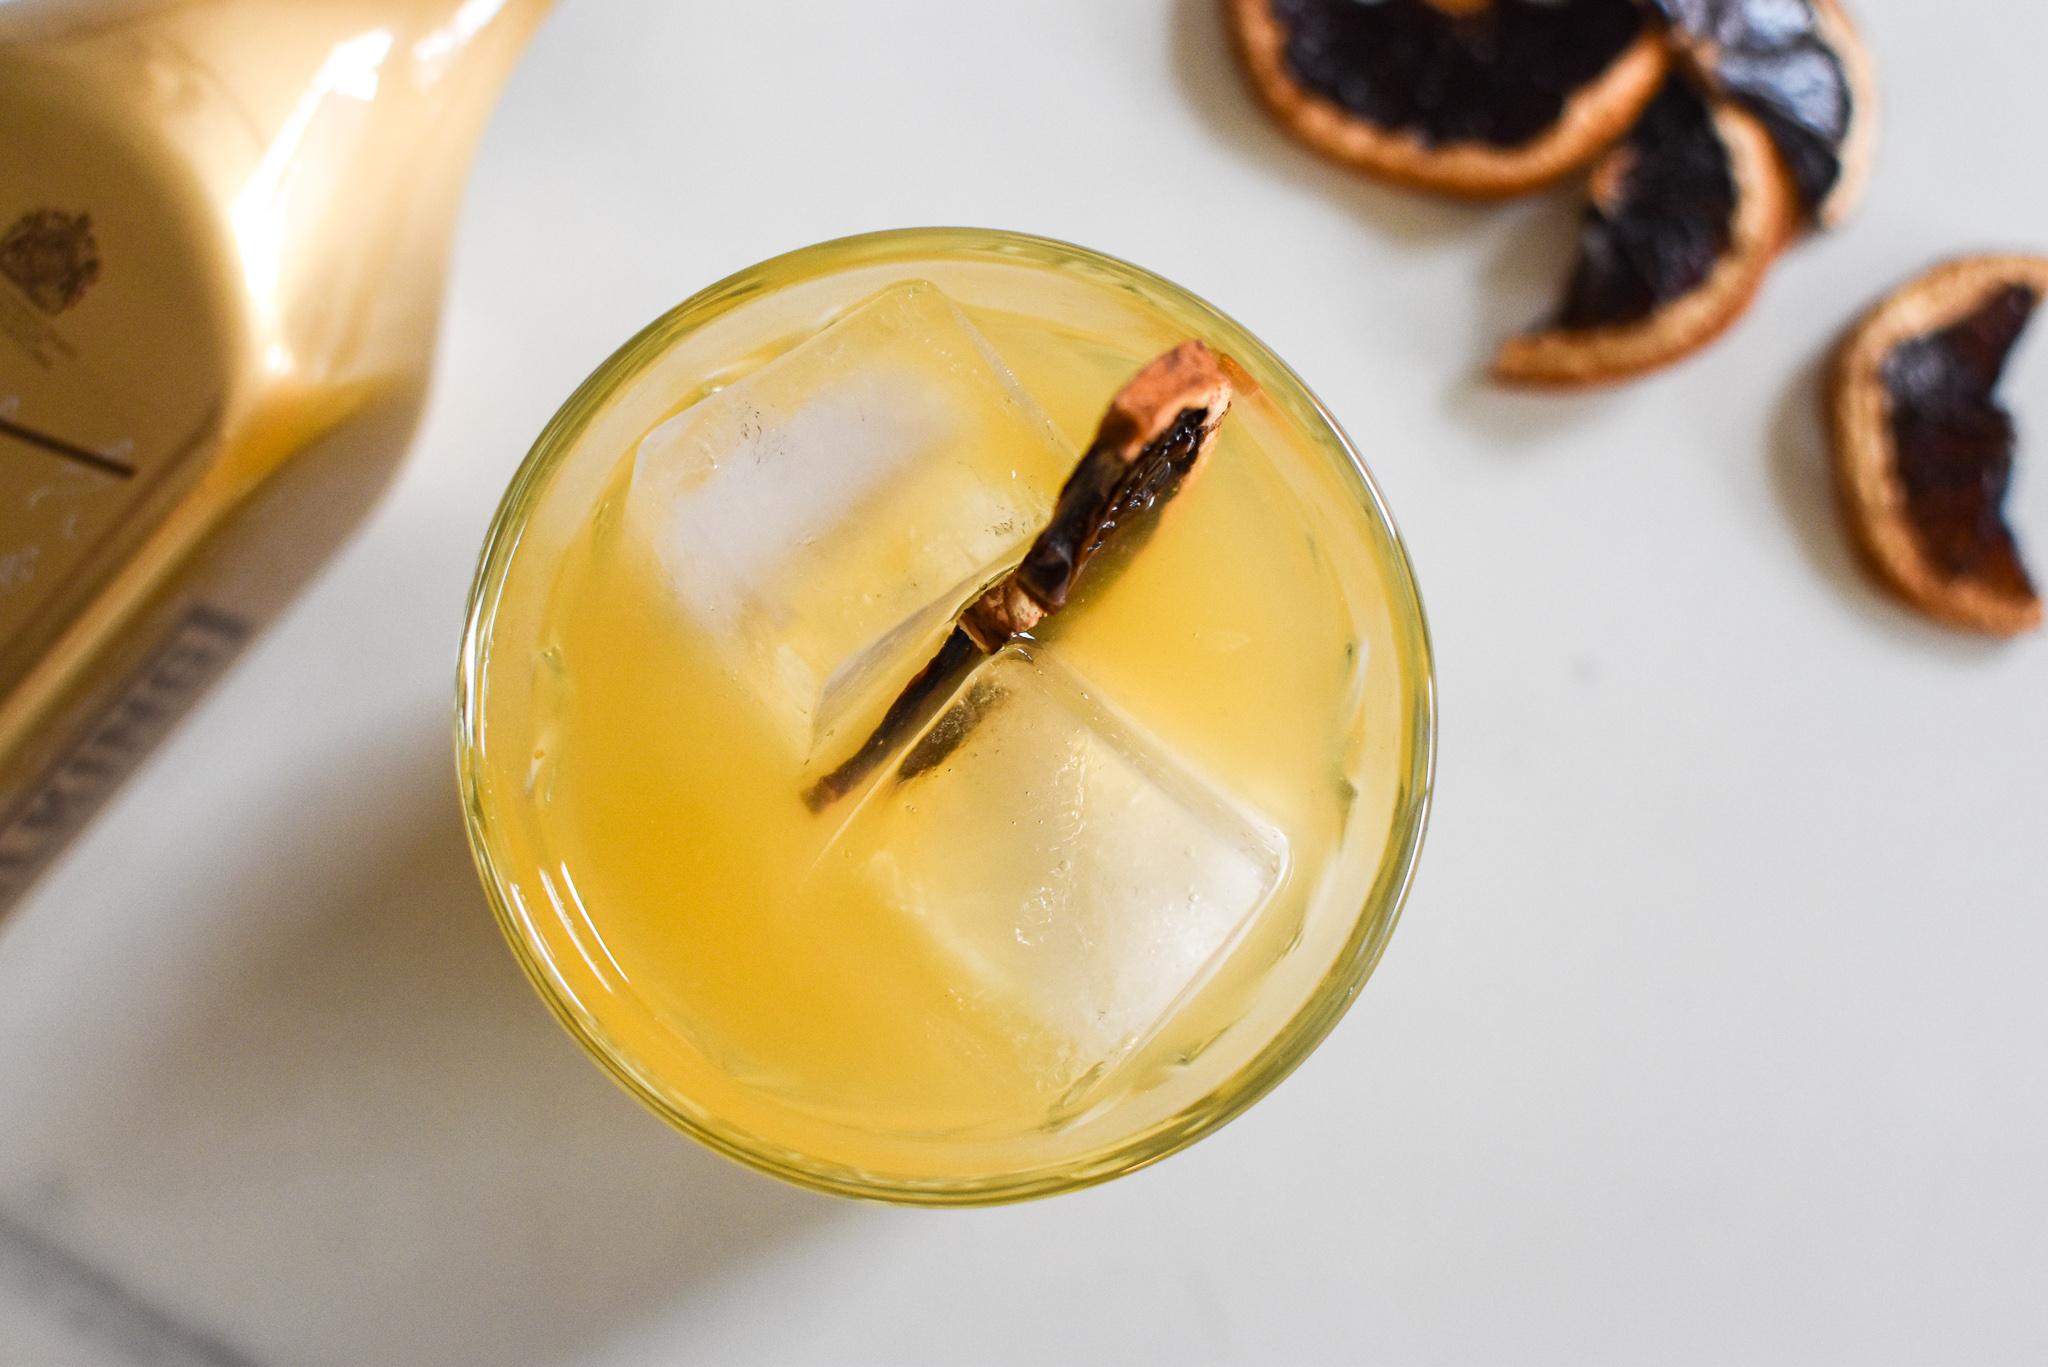 Whisky & Blood oranges